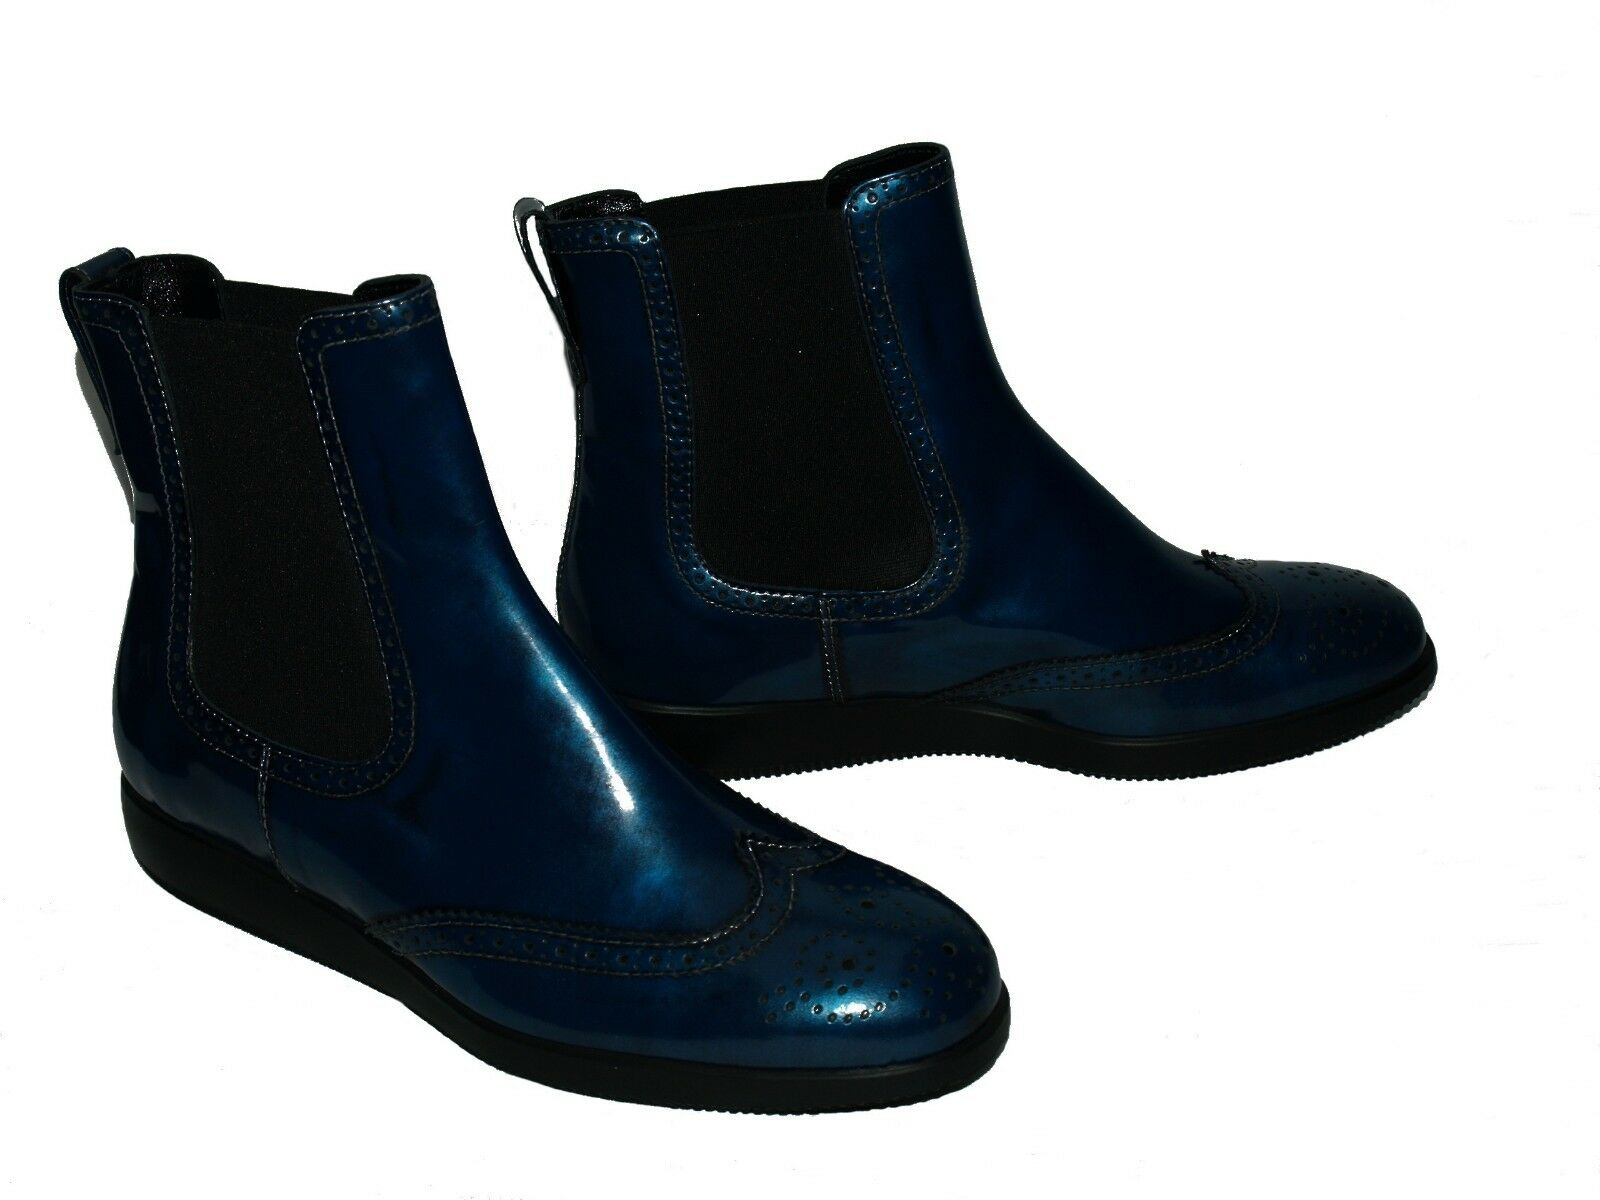 Hogan Ankle boot Polish blue Size 39